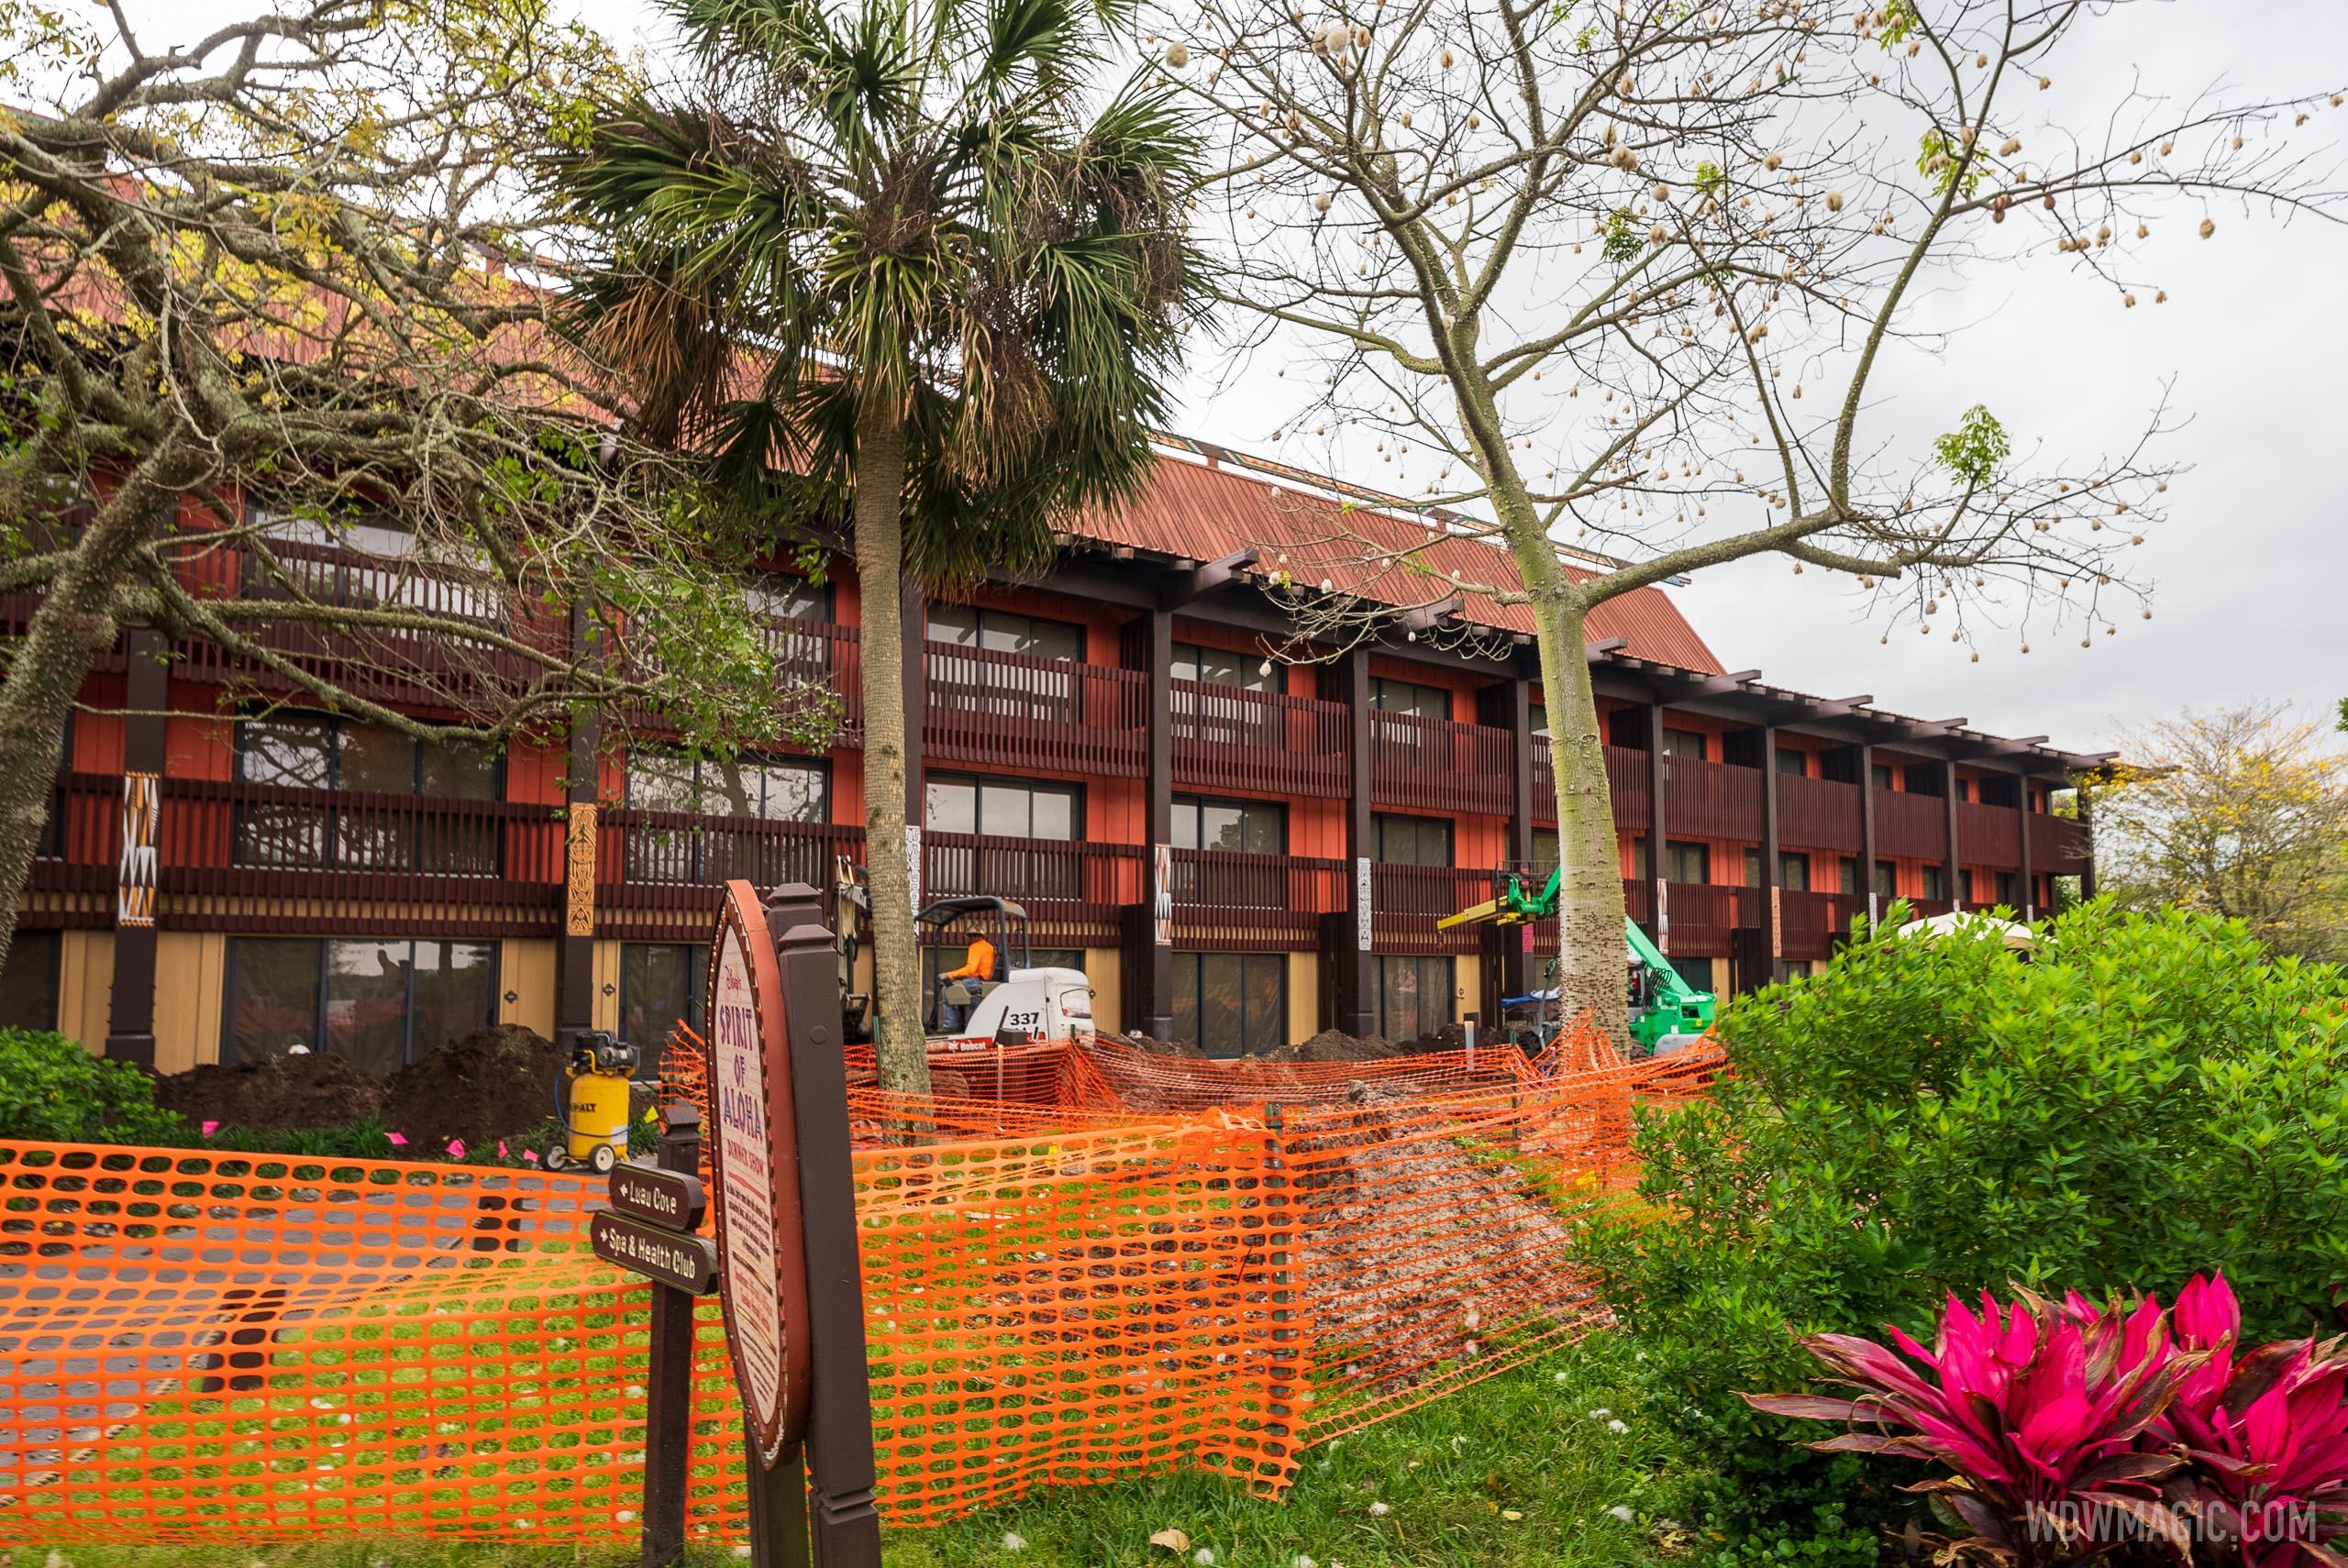 Polynesian Village Resort construction - March 29 2021